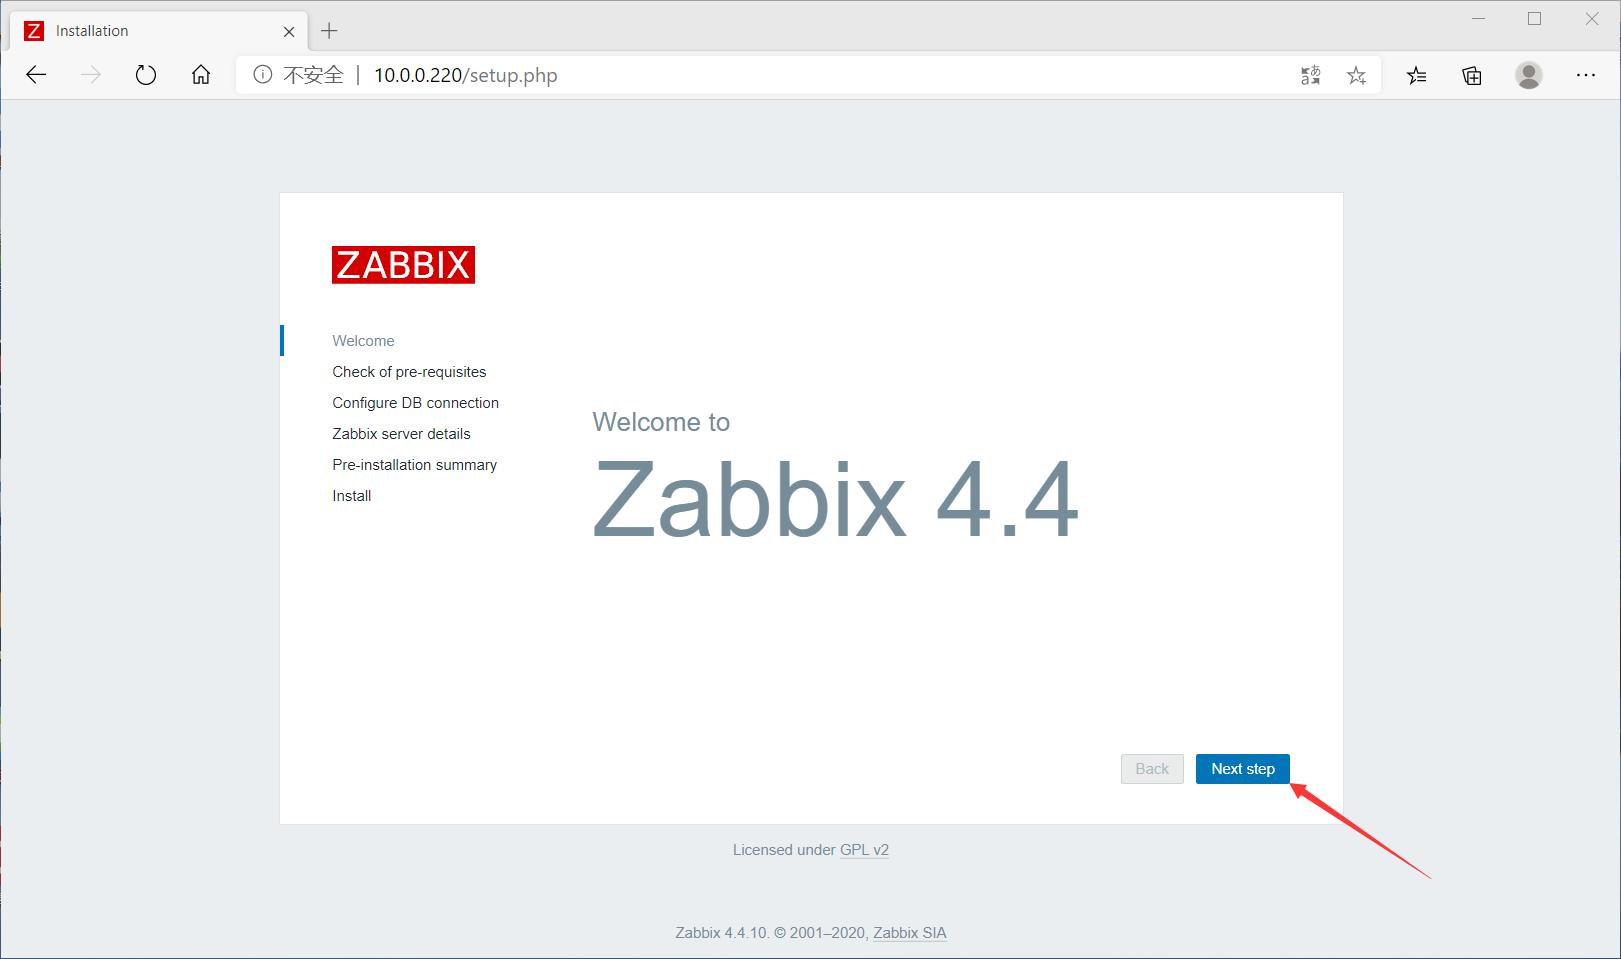 zabbix_install-1.png